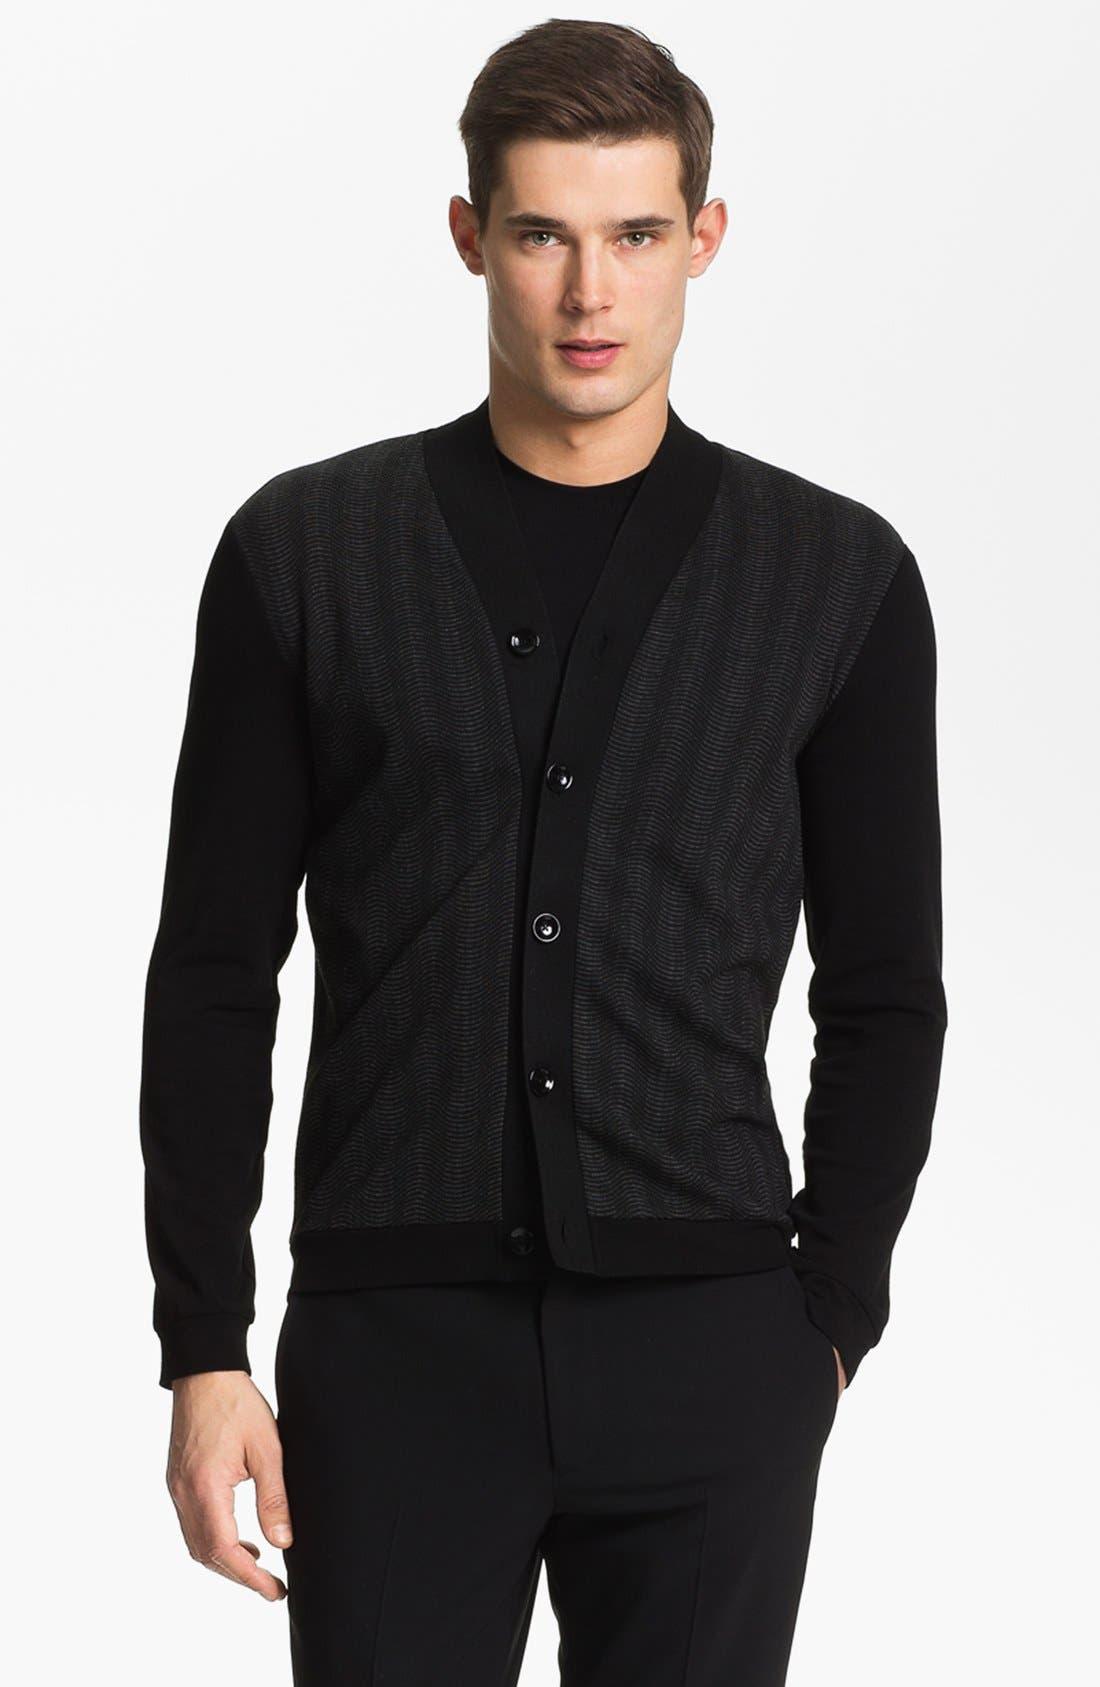 Alternate Image 1 Selected - Armani Collezioni Jersey Knit Cardigan